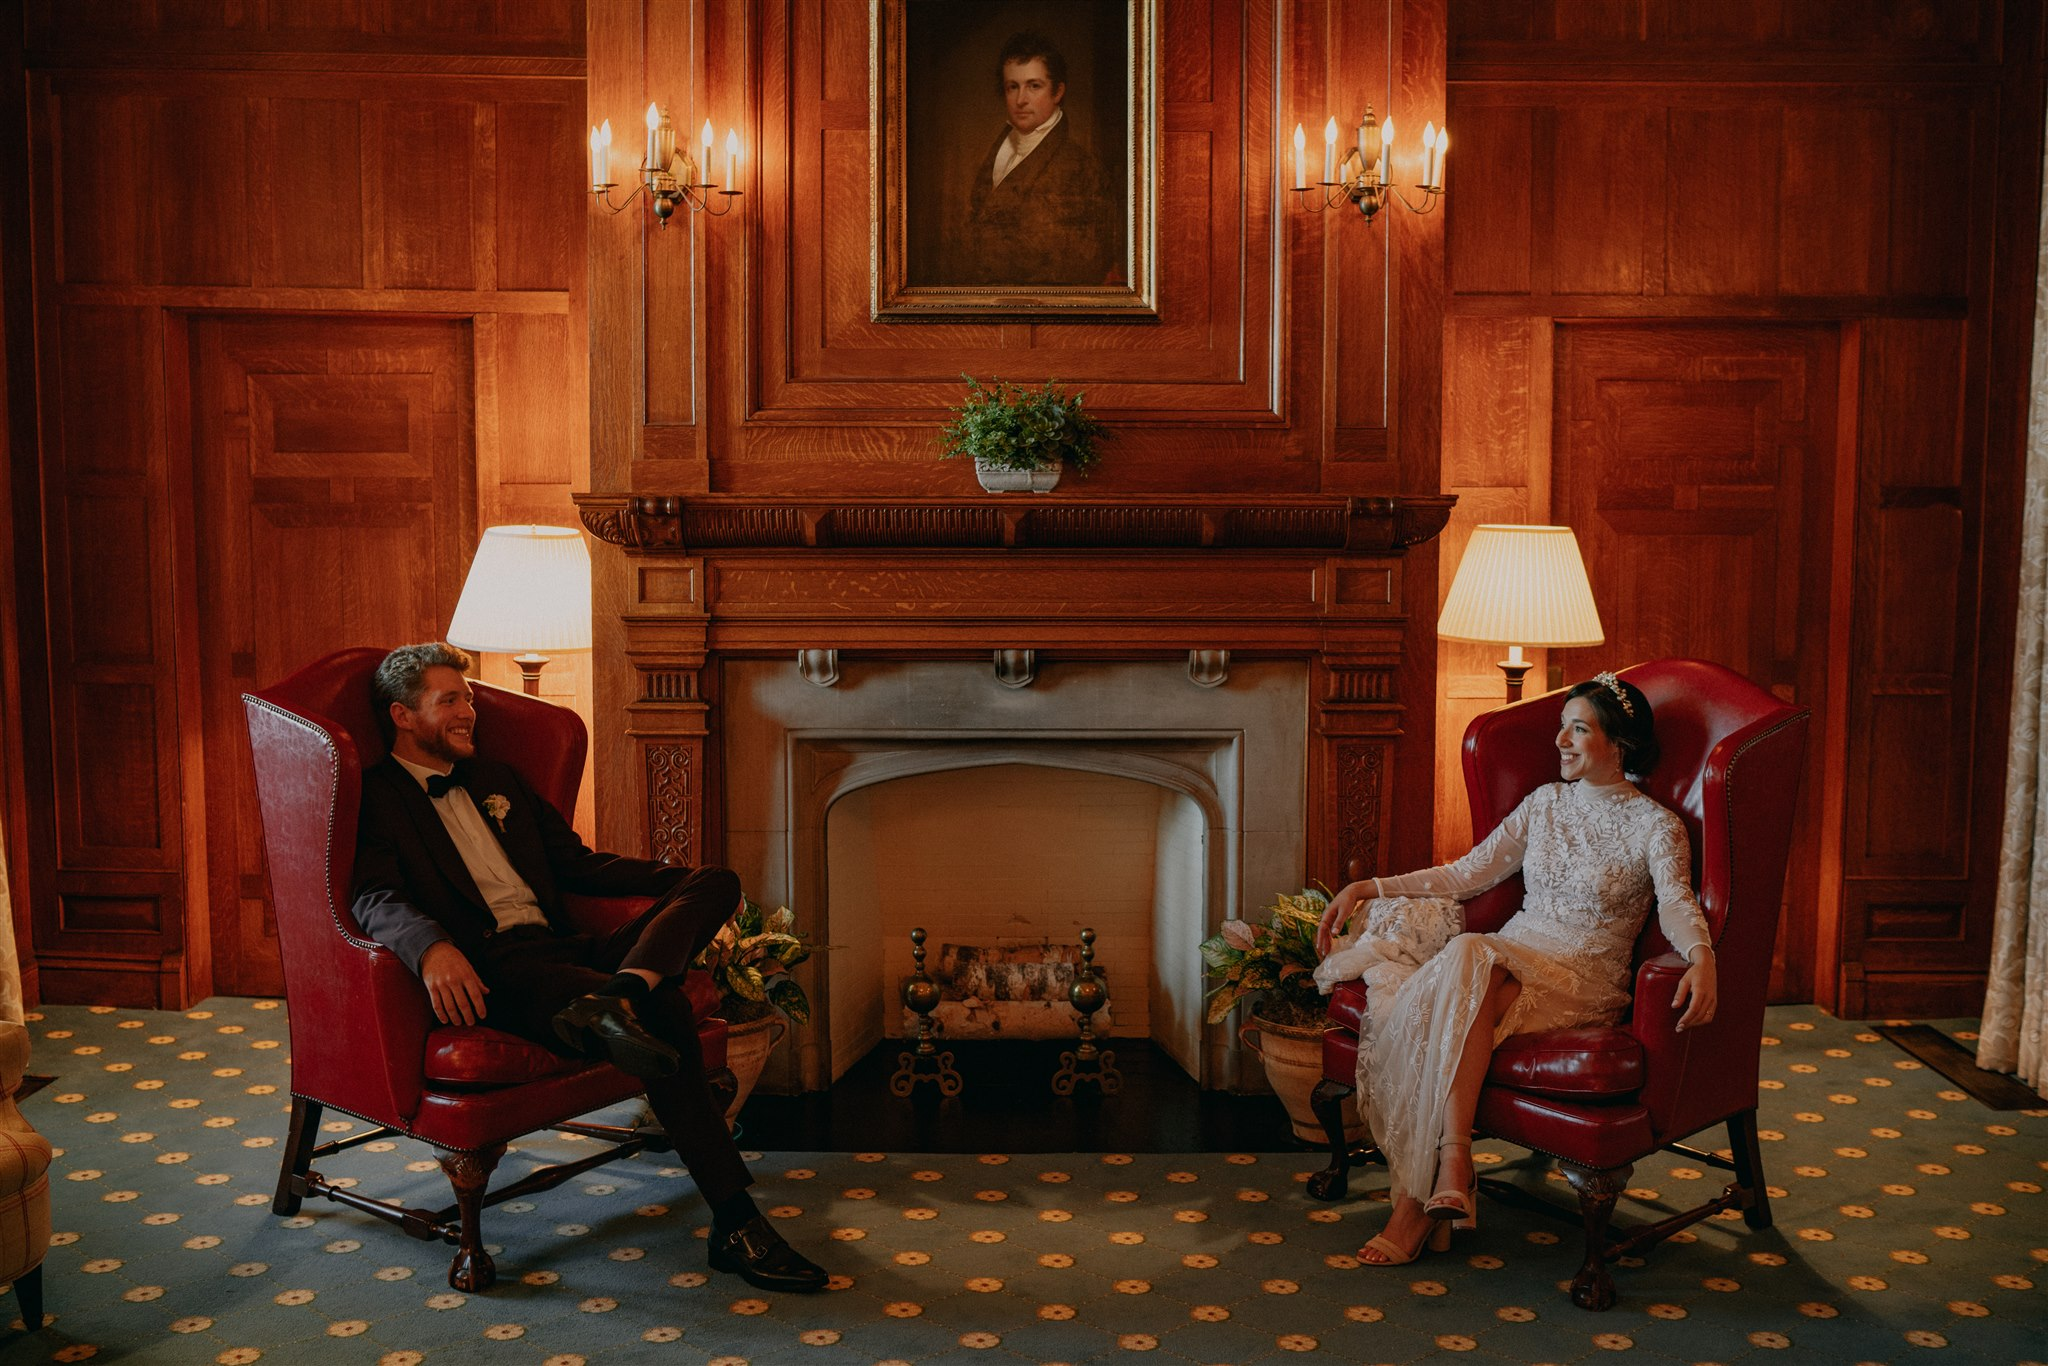 Chellise_Michael_Photography_Hudson_Valley_Wedding_Photographer_Otesaga_Hotel-4000.jpg